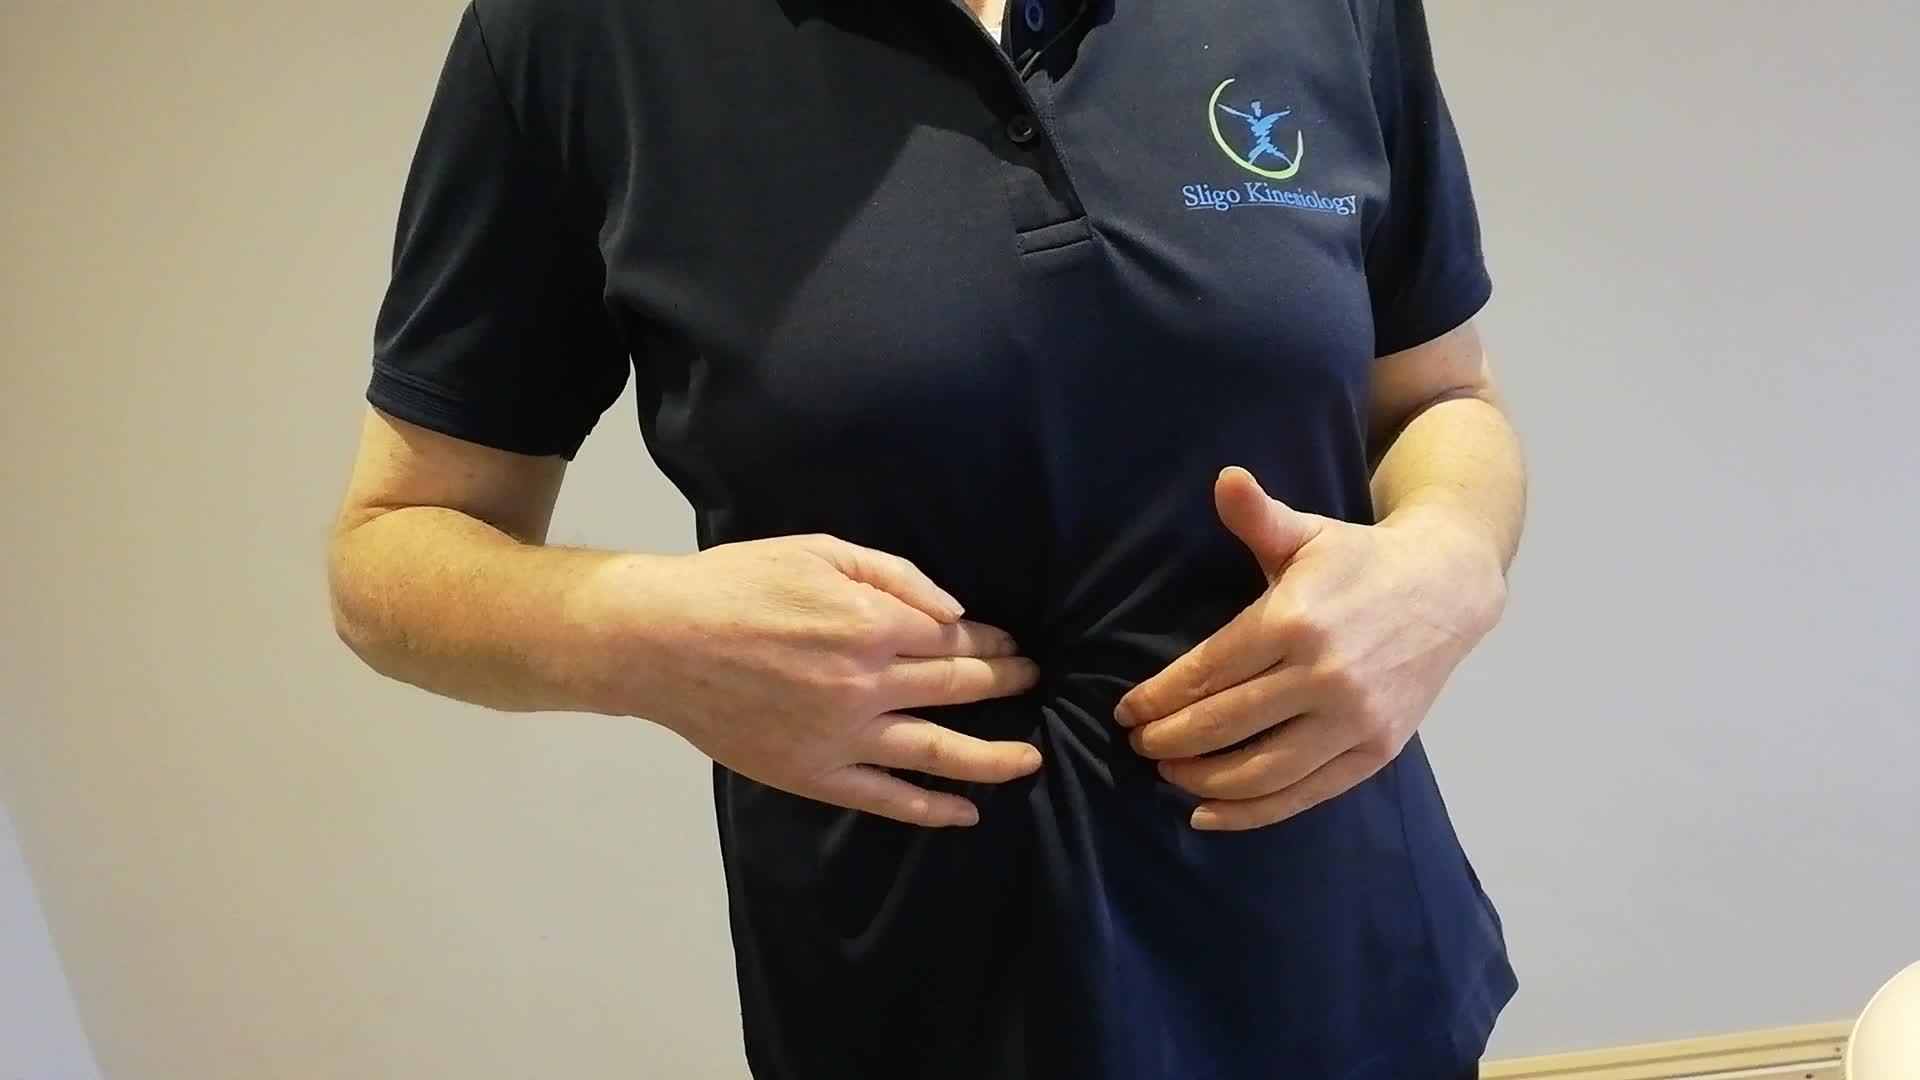 Help Lower back pain